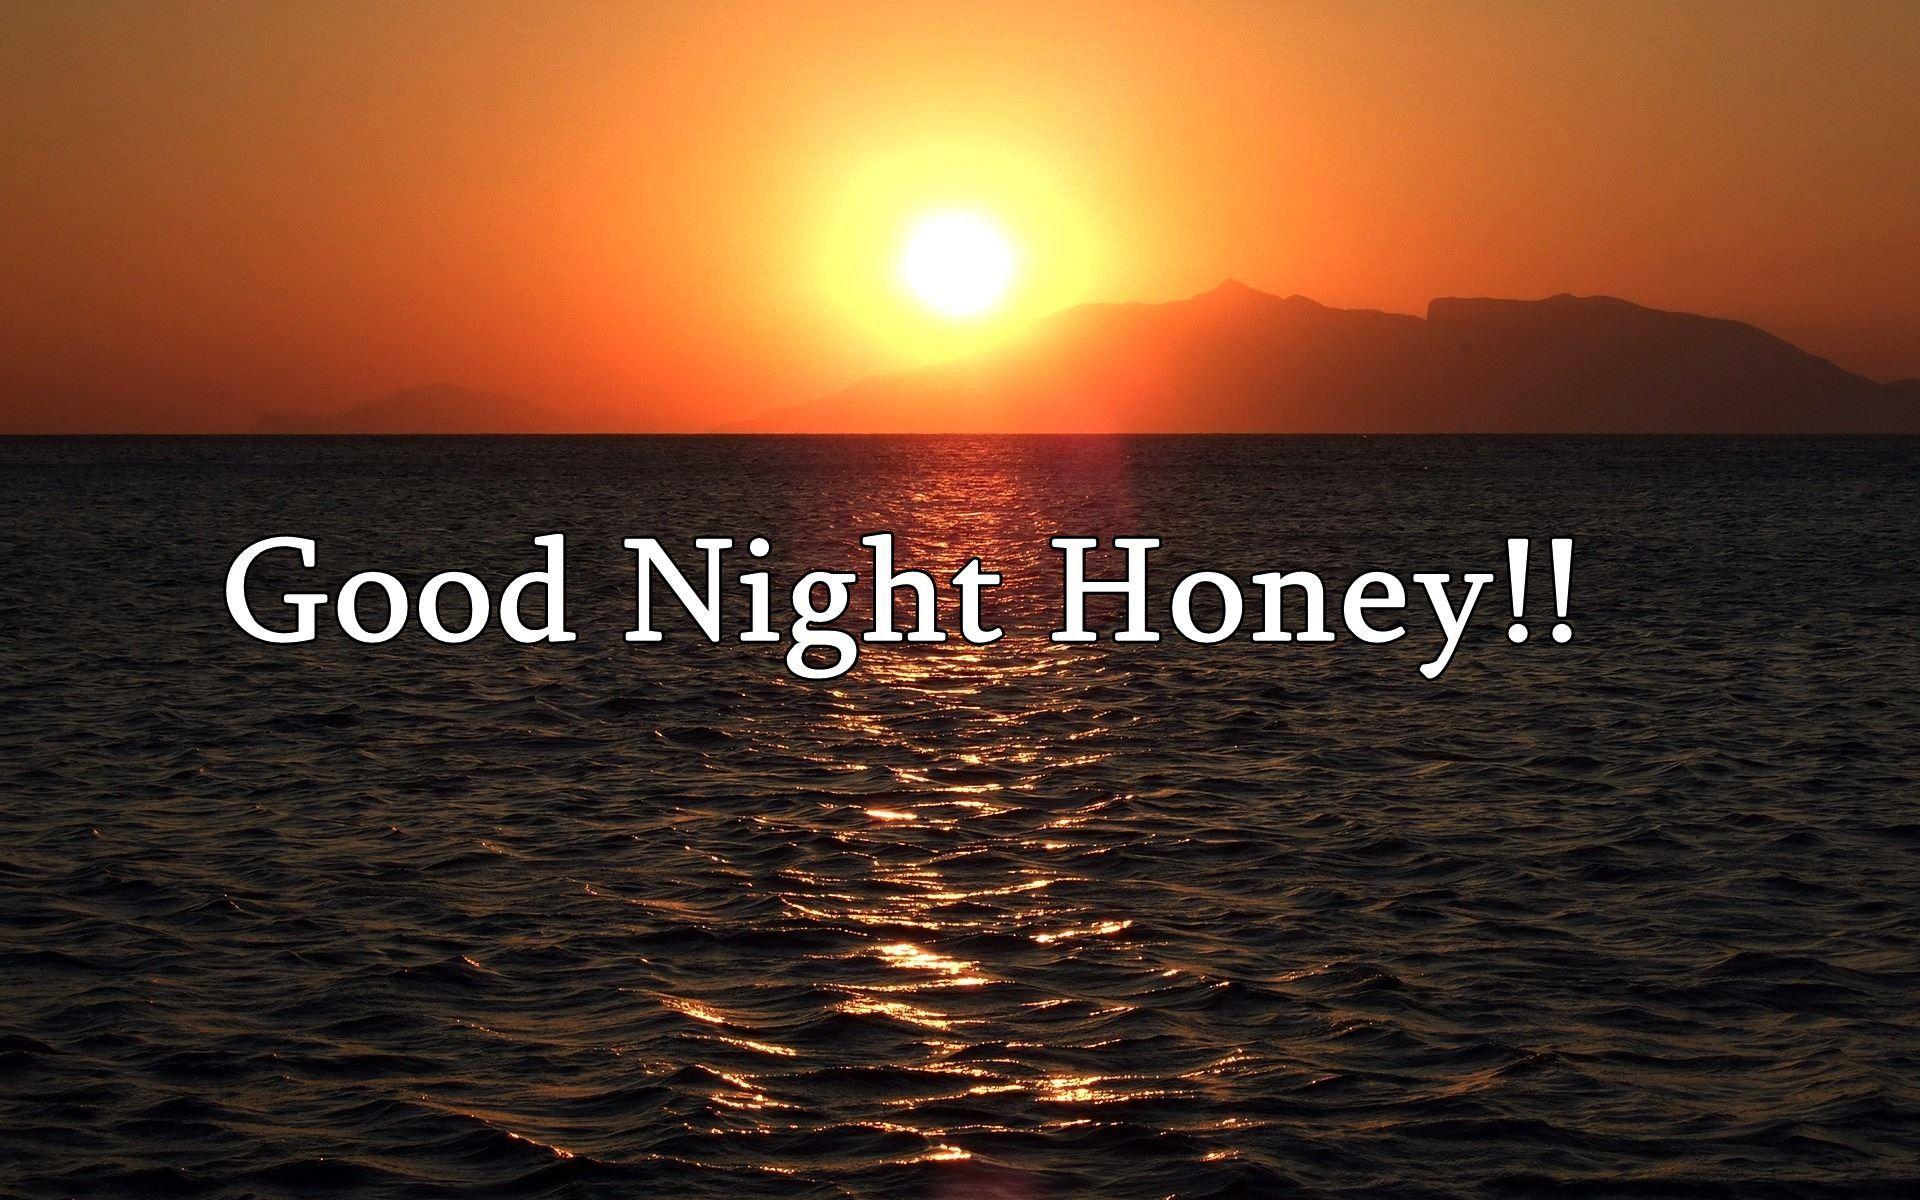 Good Morning Honey Quotes: Good Night Honey